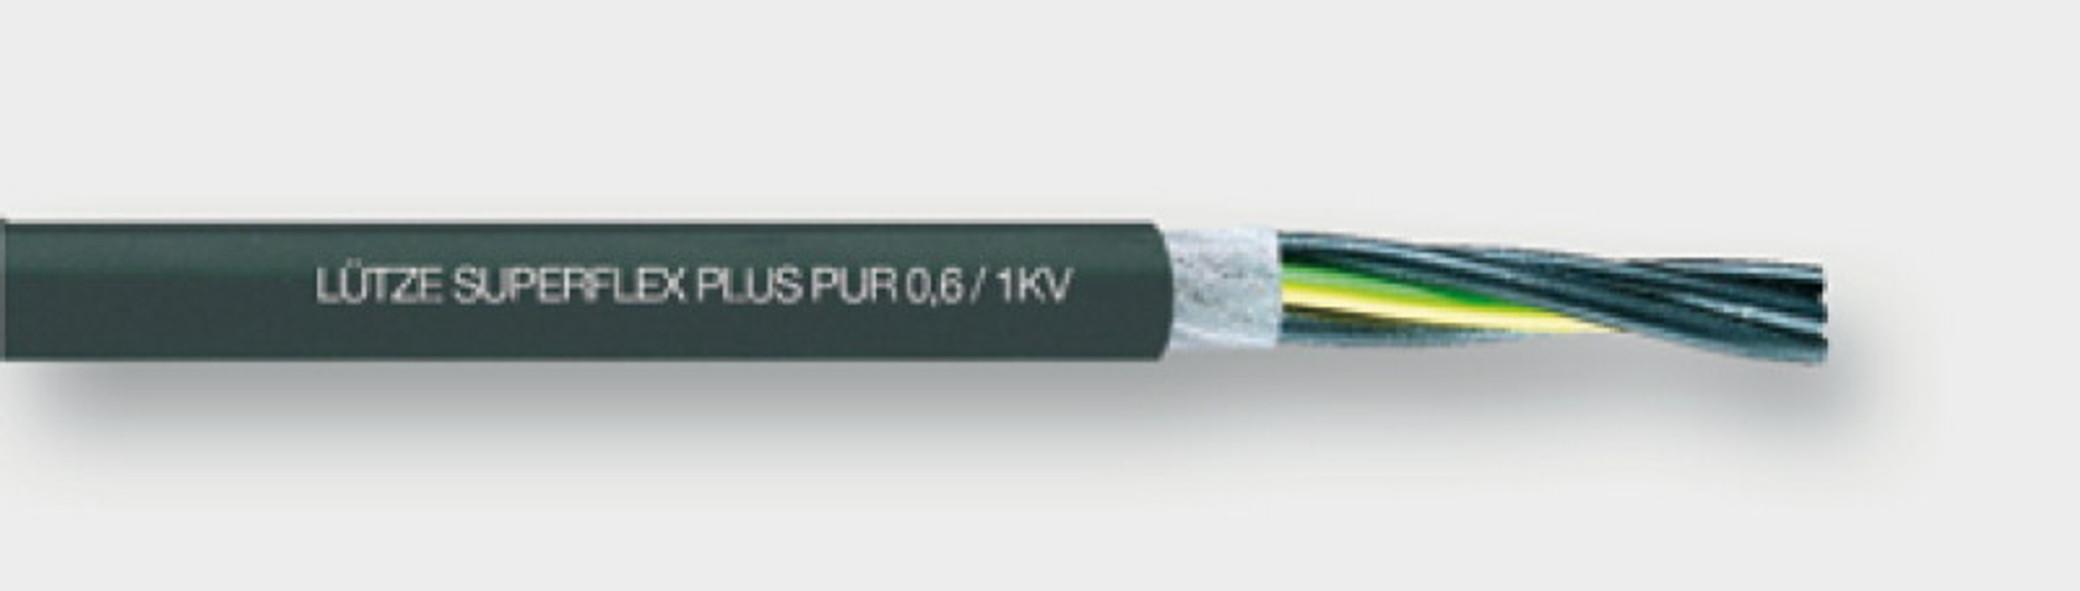 111375 Ltze Superflex Plus M Pur 06 1 Kv Motor Energy Supply Cables Usa Fiber Optic Glass Attributes And Characteristics